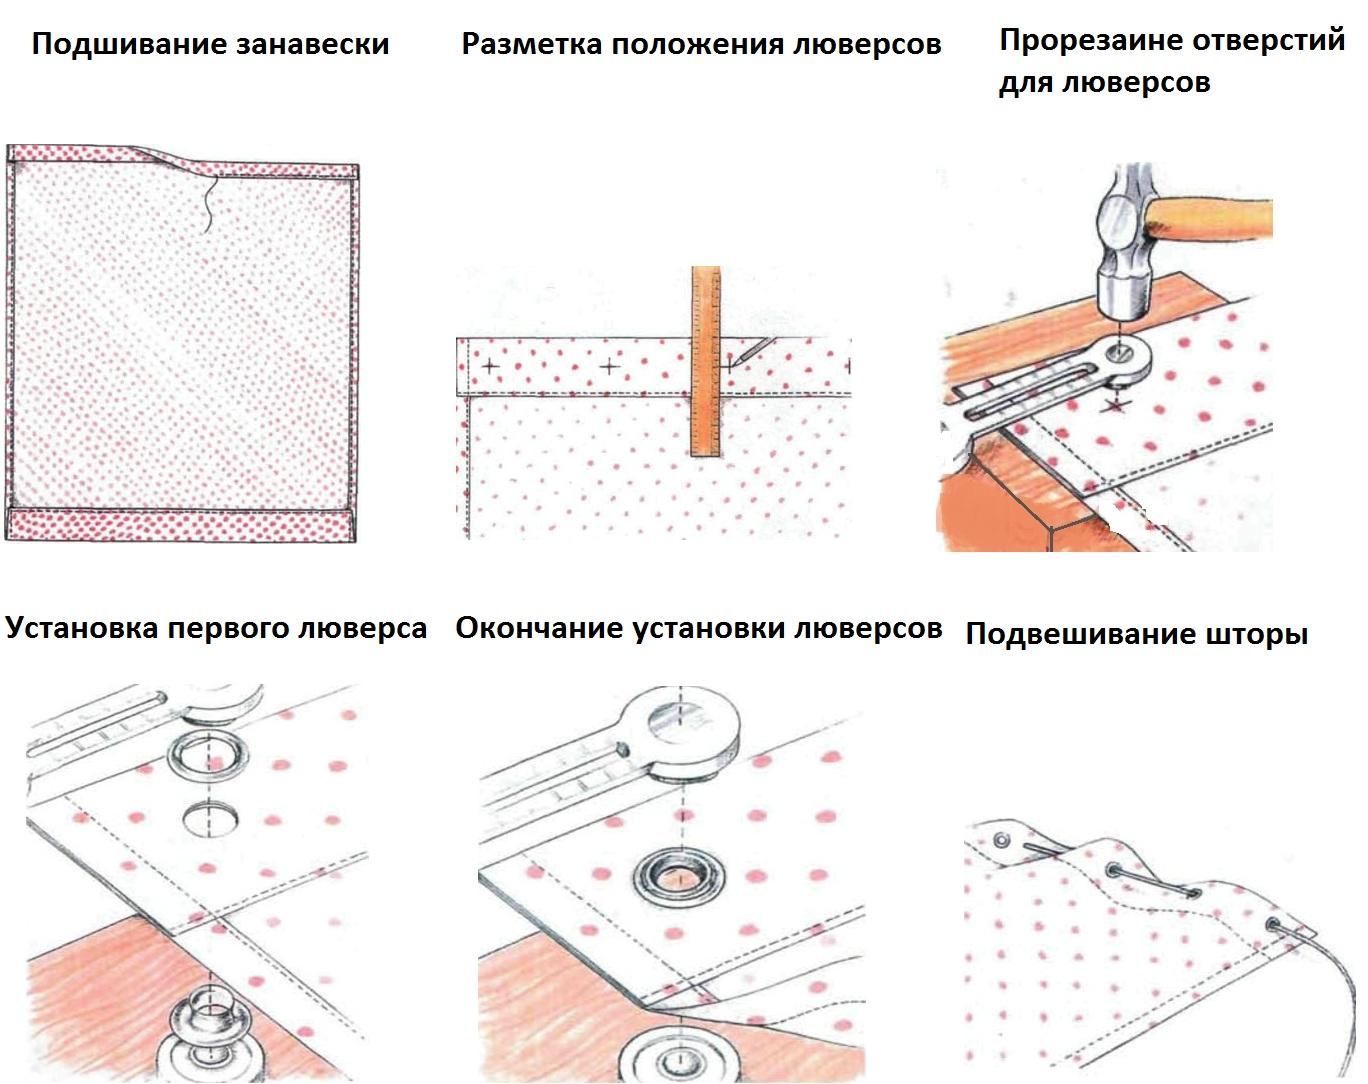 процесс установки люверсов